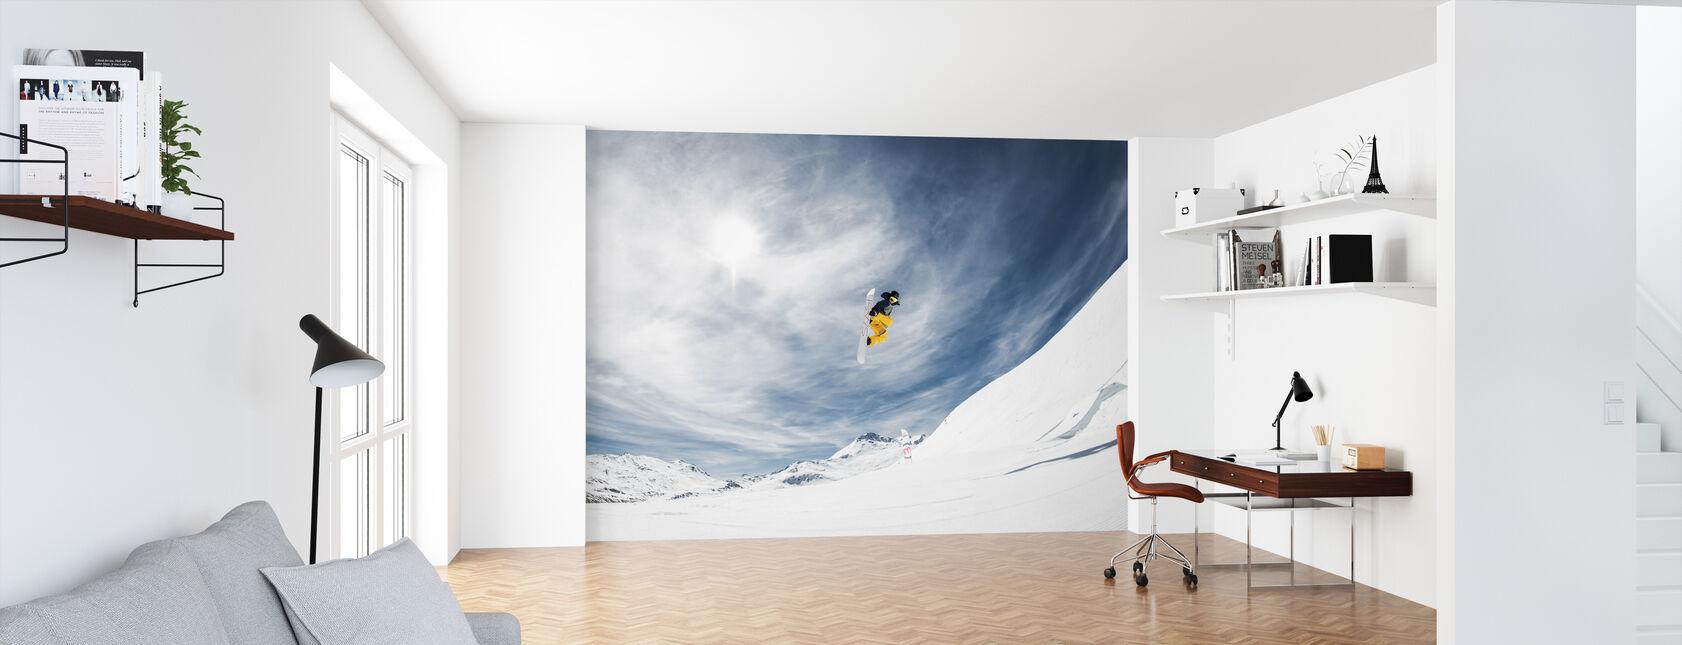 One Fine Method Grab - Wallpaper - Office